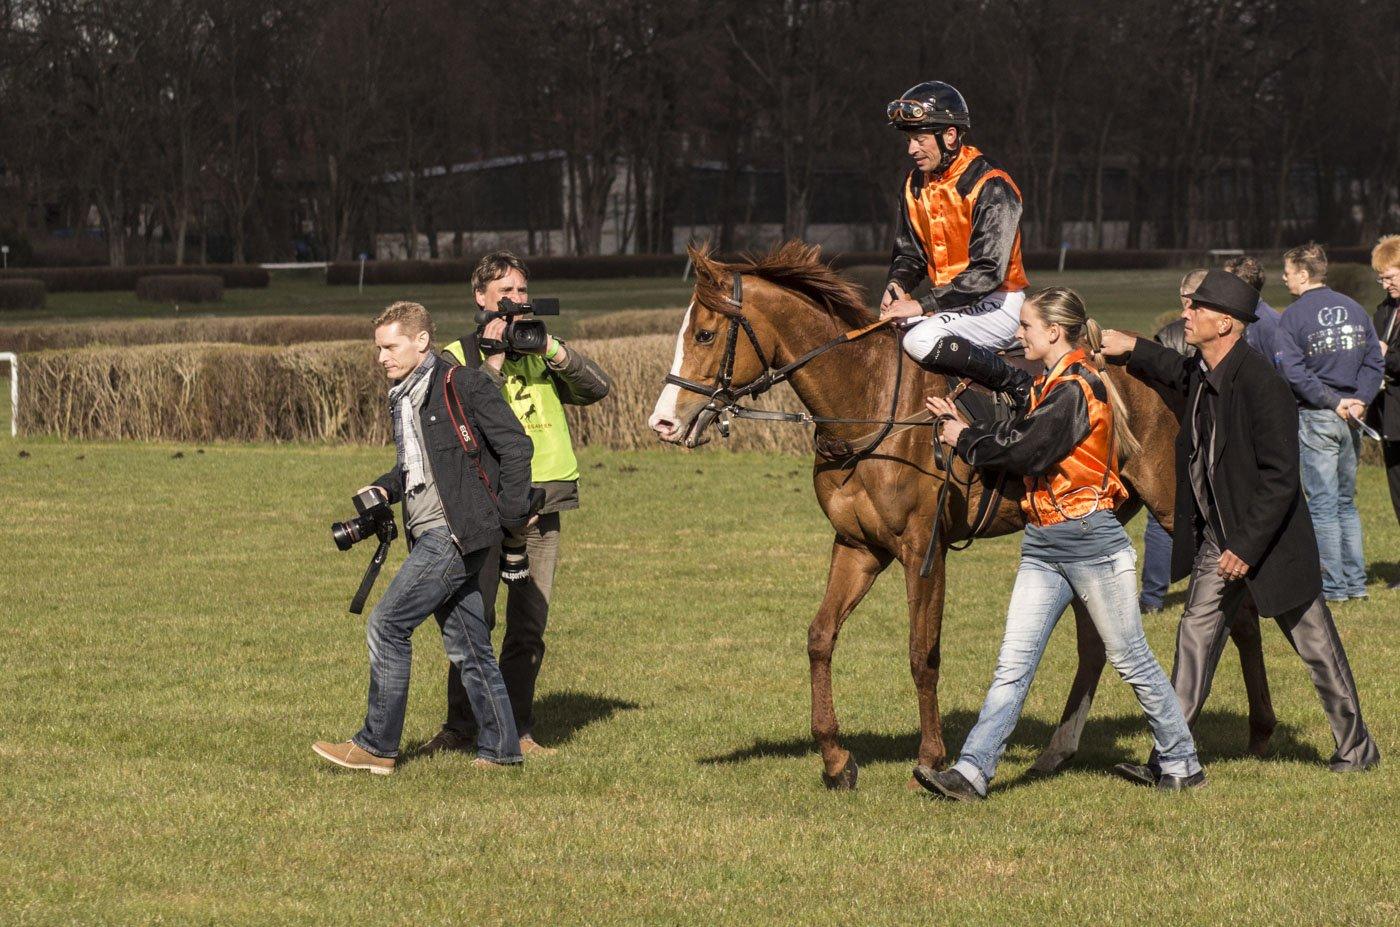 berlin-hoppegarten-Pferderennen-Ostern-2015-7146